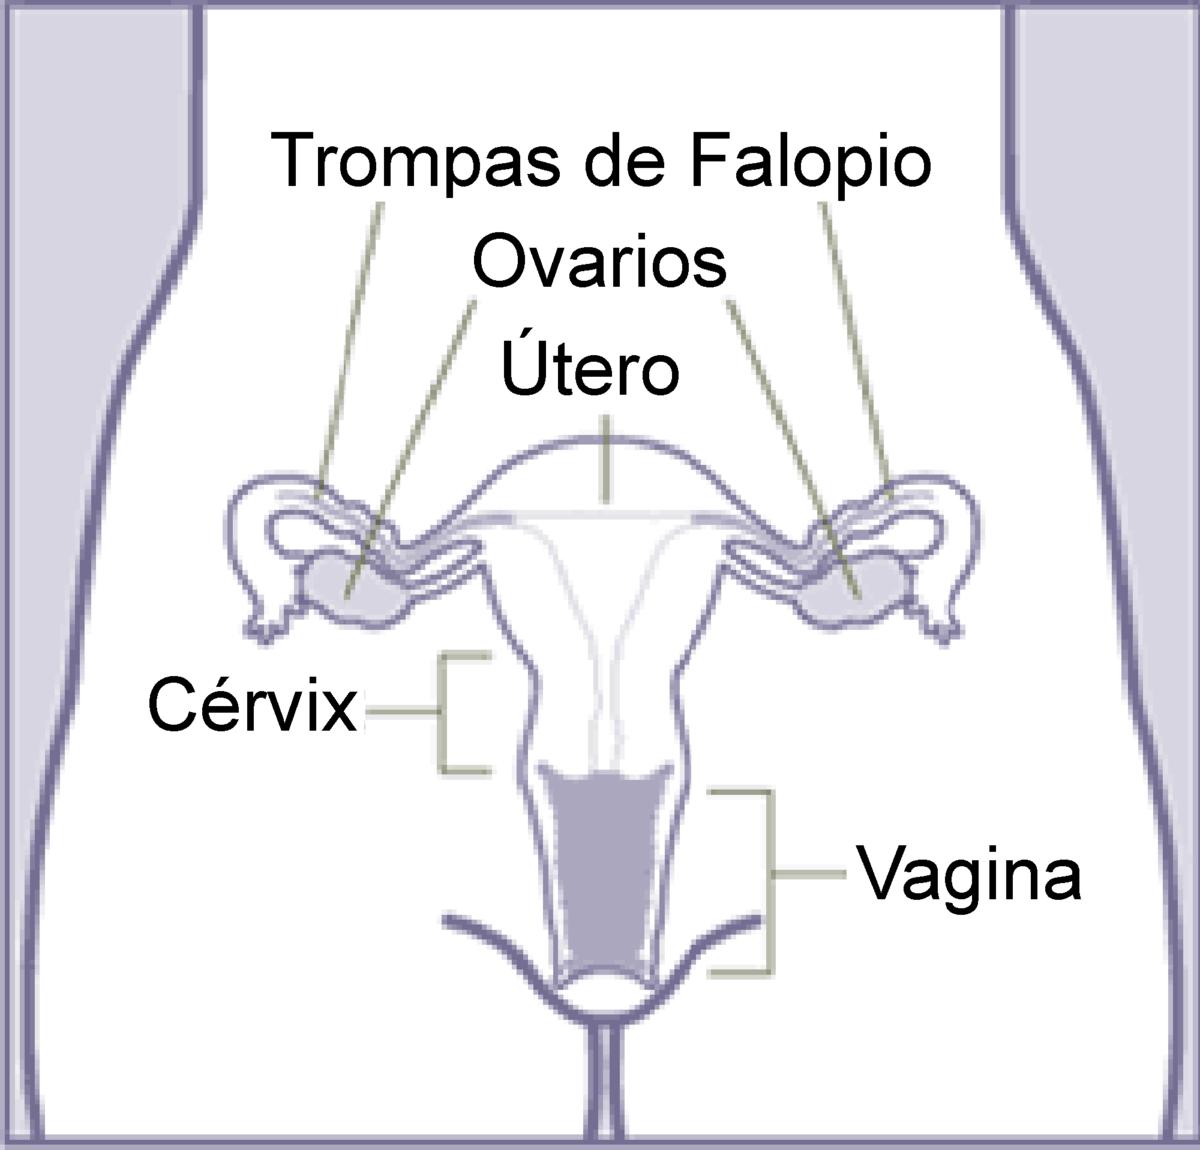 Aparato genital femenino - Wikipedia, la enciclopedia libre